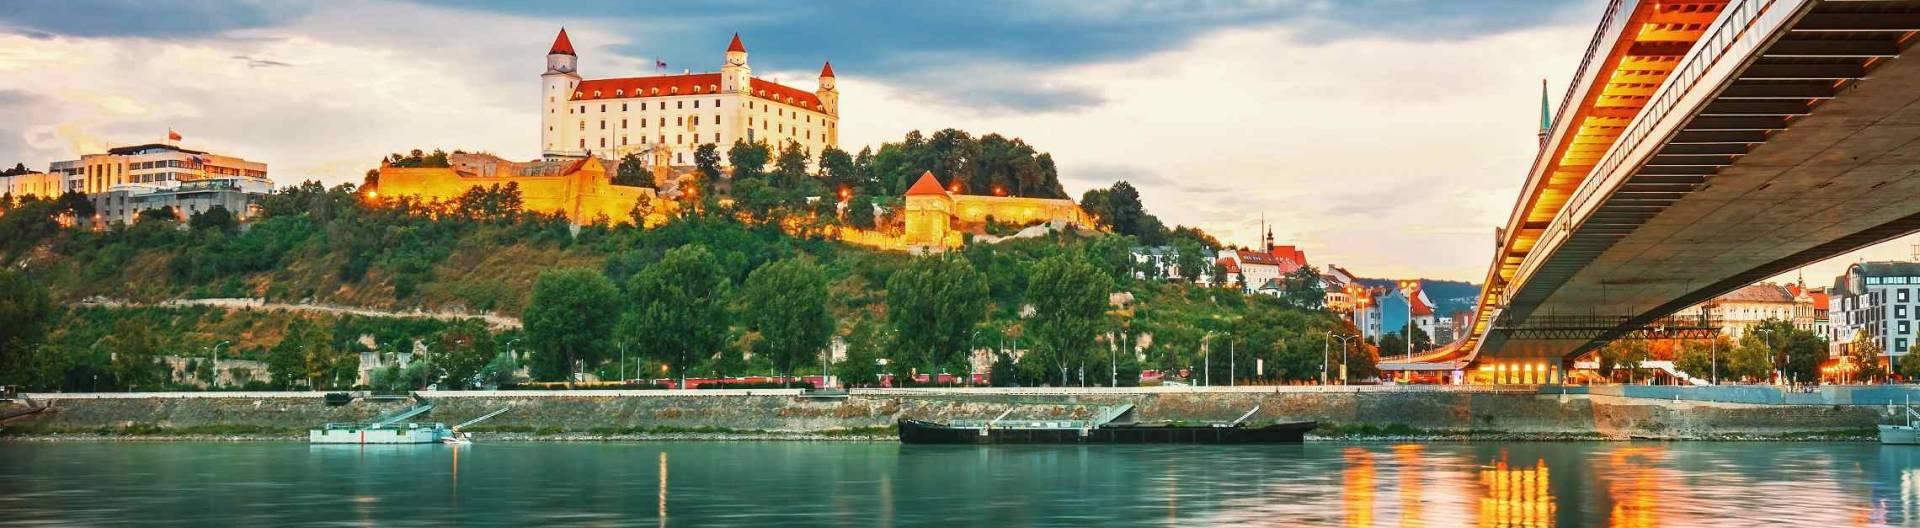 Bratislavan-linna-Slovakia-1920x528.jpg